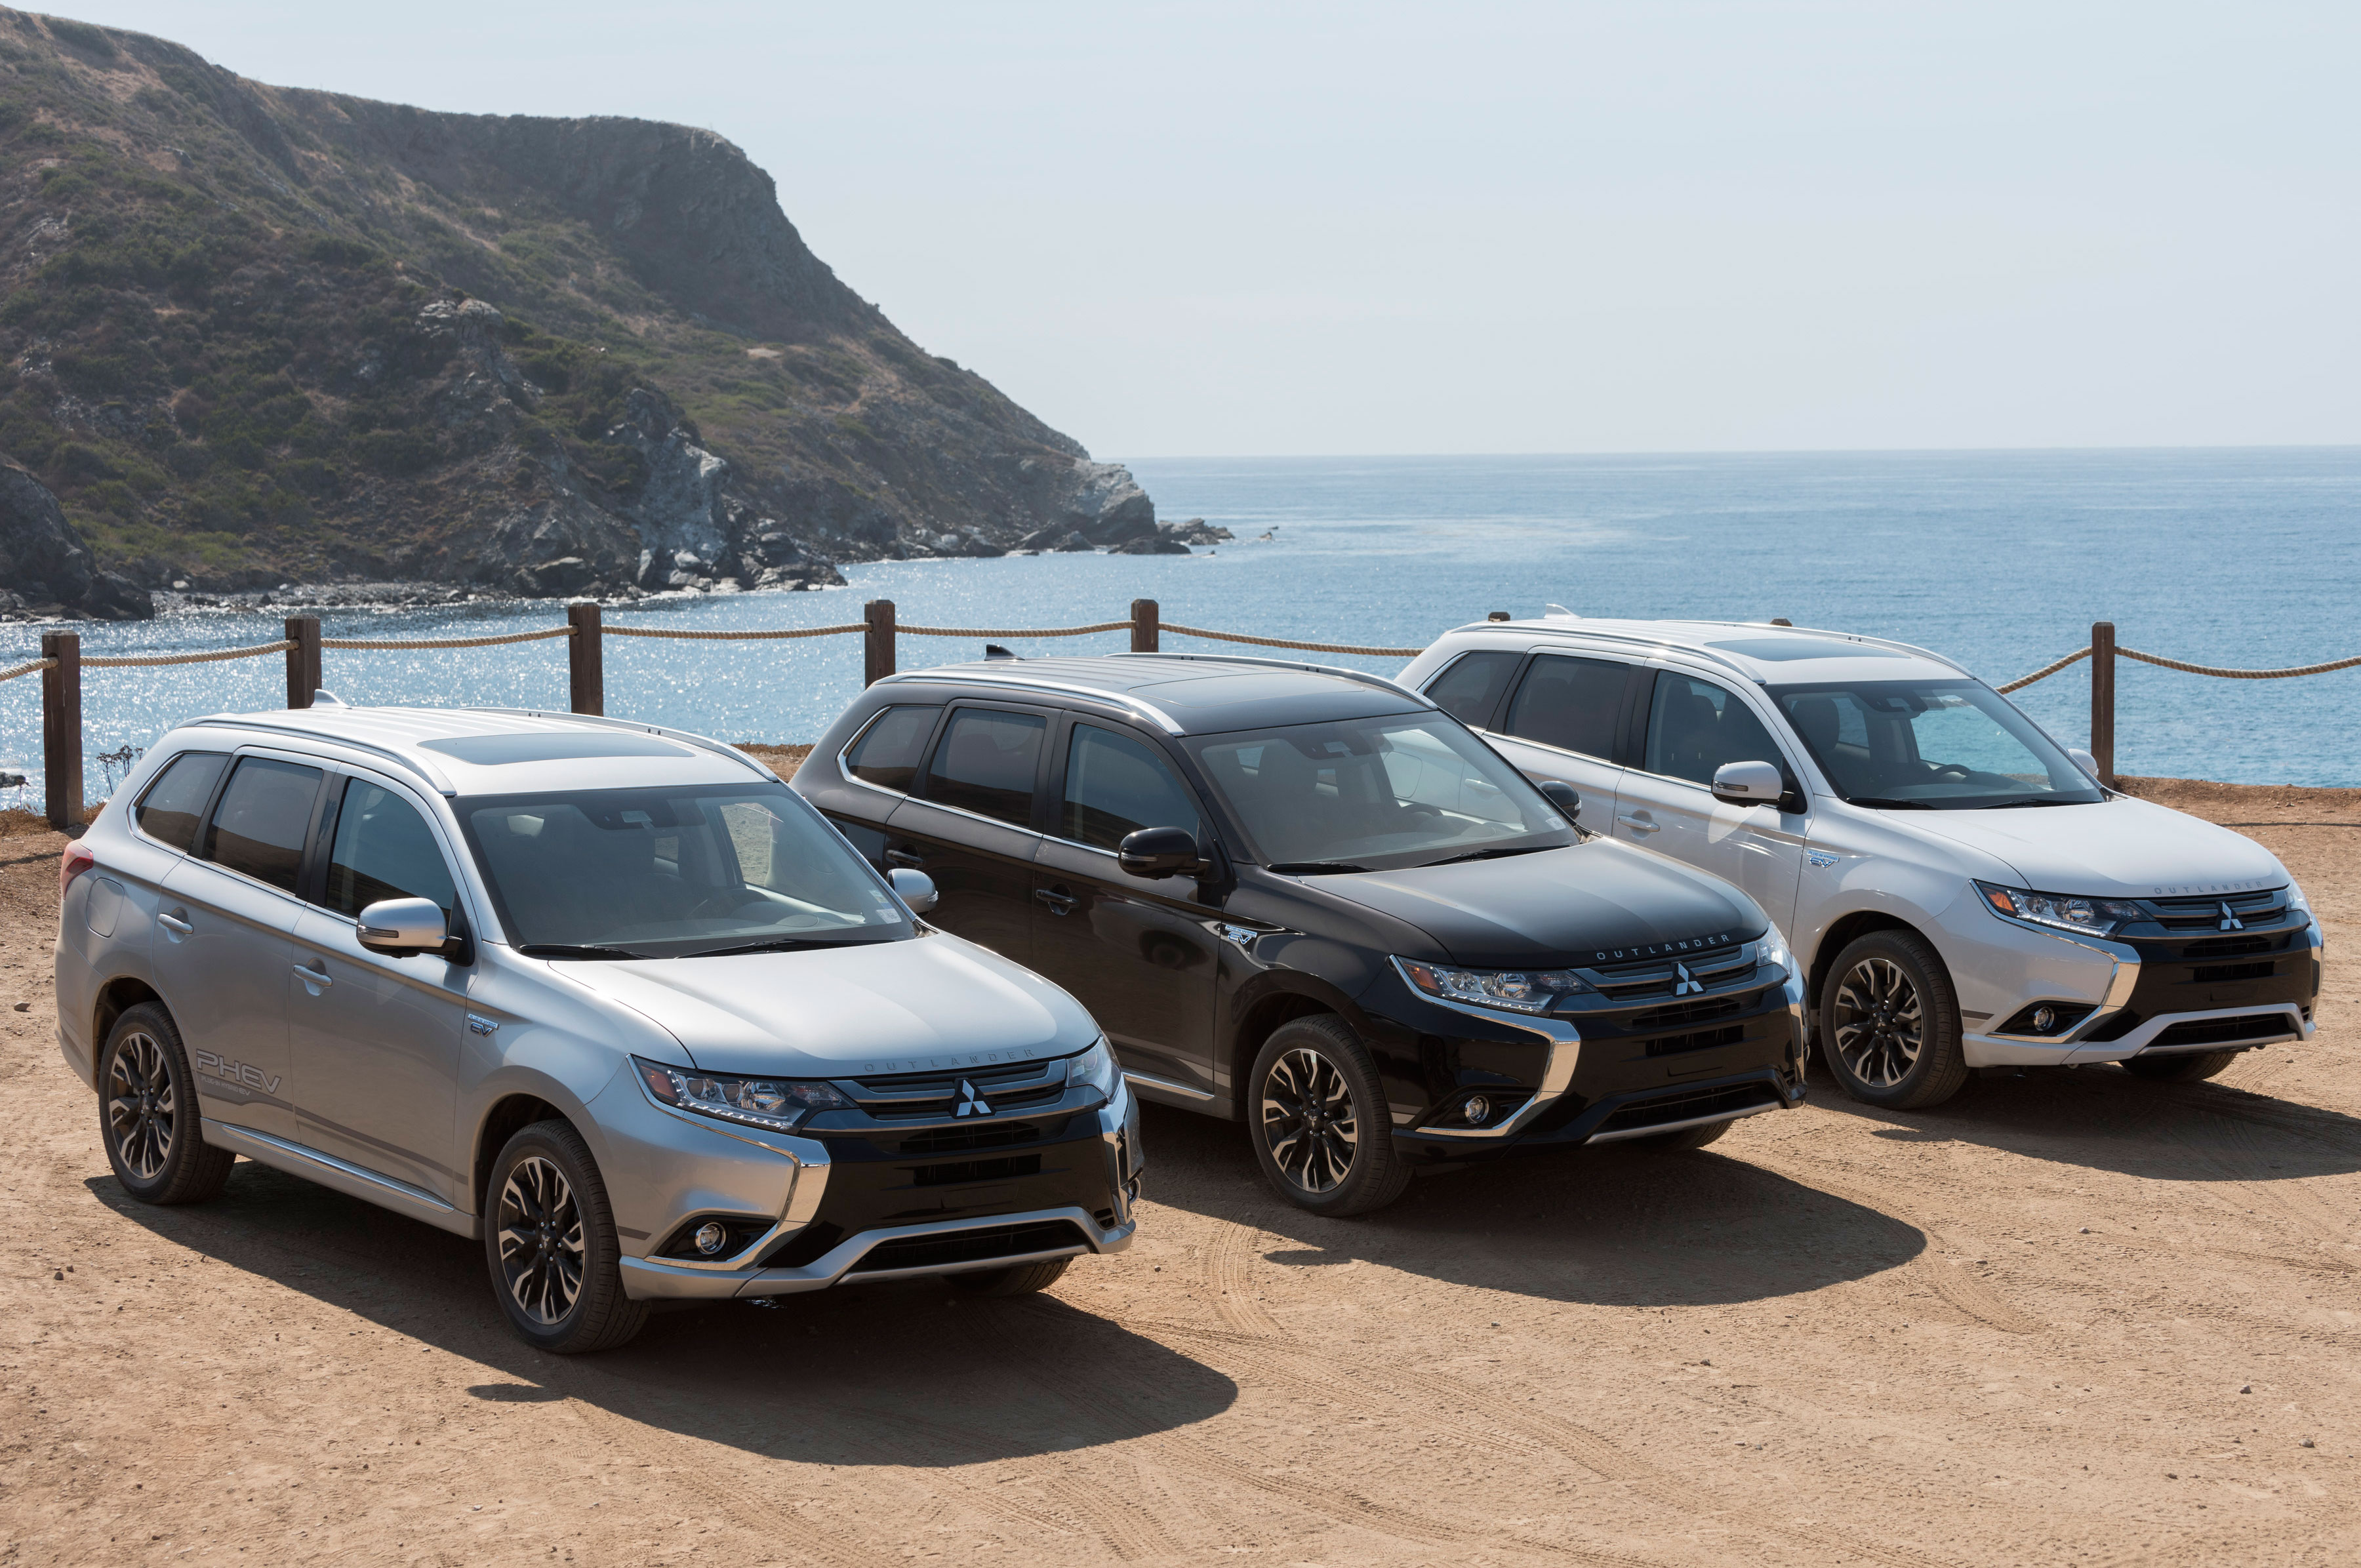 2018 Mitsubishi Outlander PHEV Front Three Quarters 2